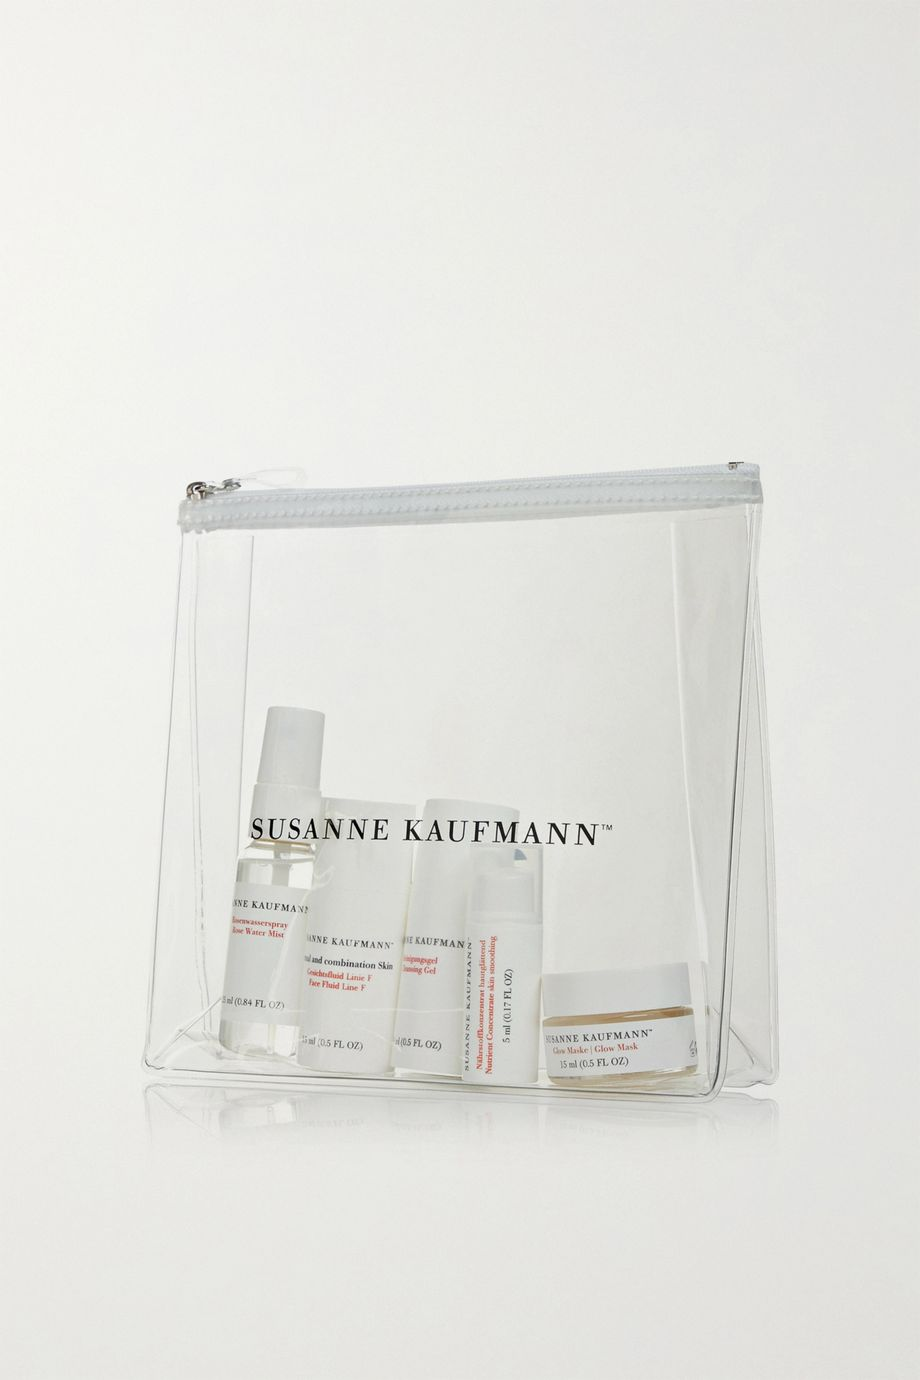 Susanne Kaufmann Holistic Beauty Kit